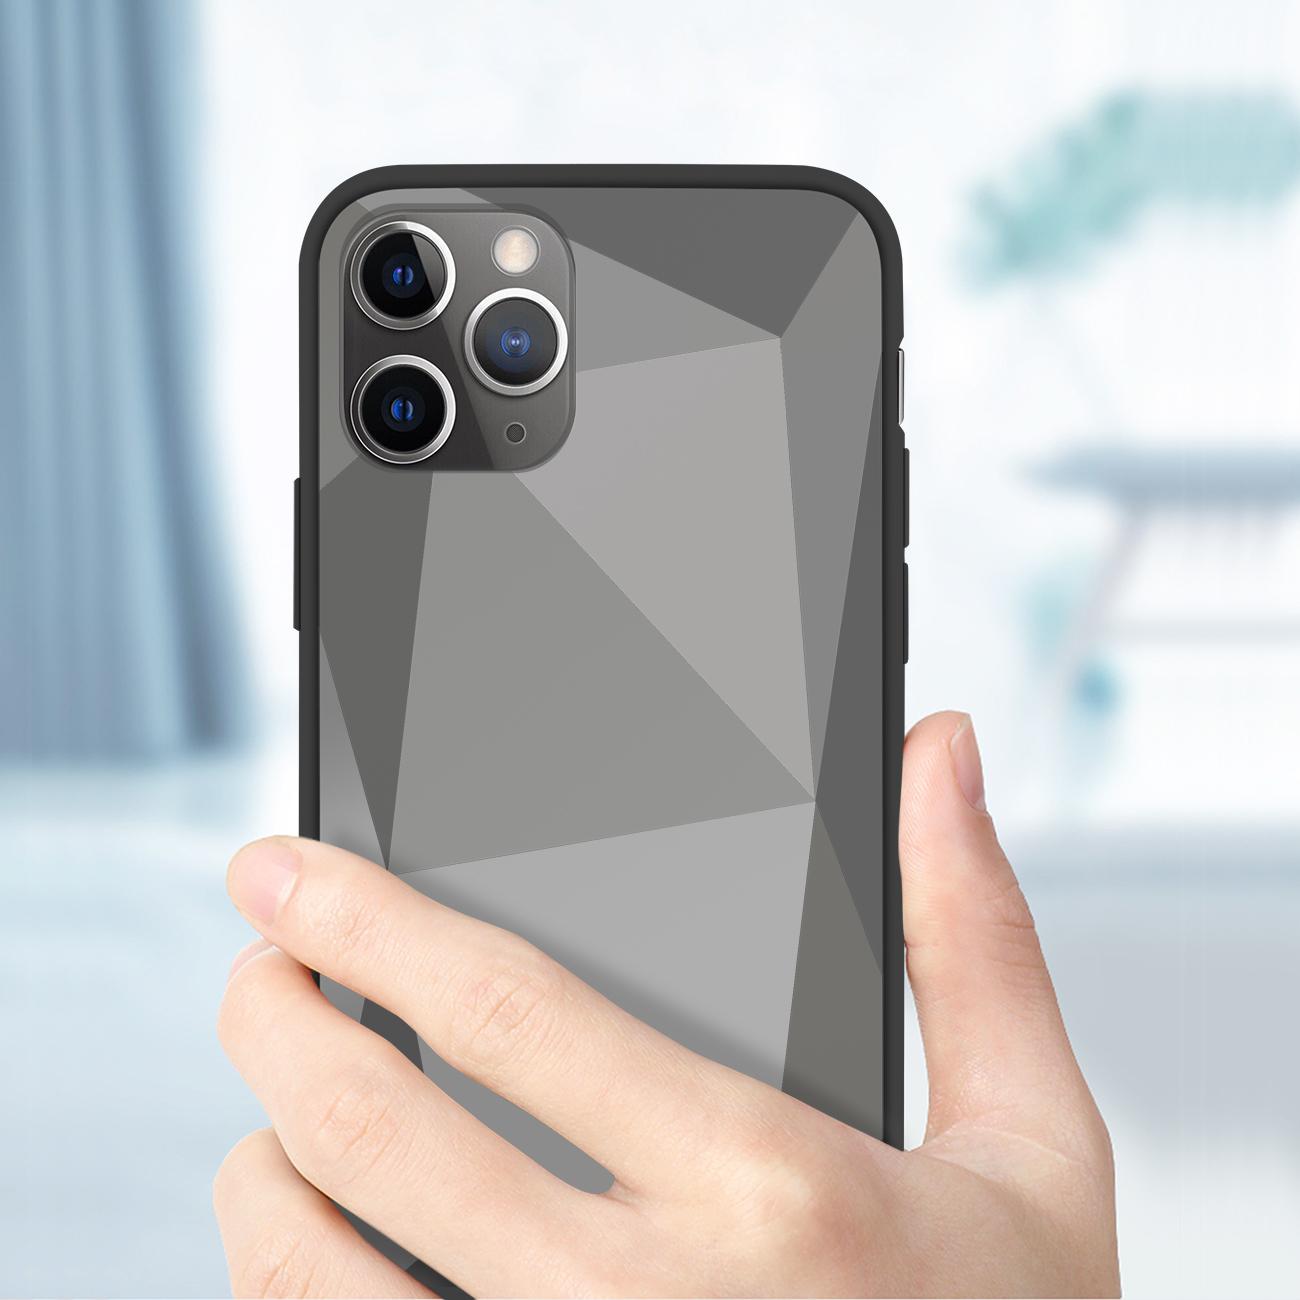 Apple iPhone 11 Pro Apple Diamond Cases In Black